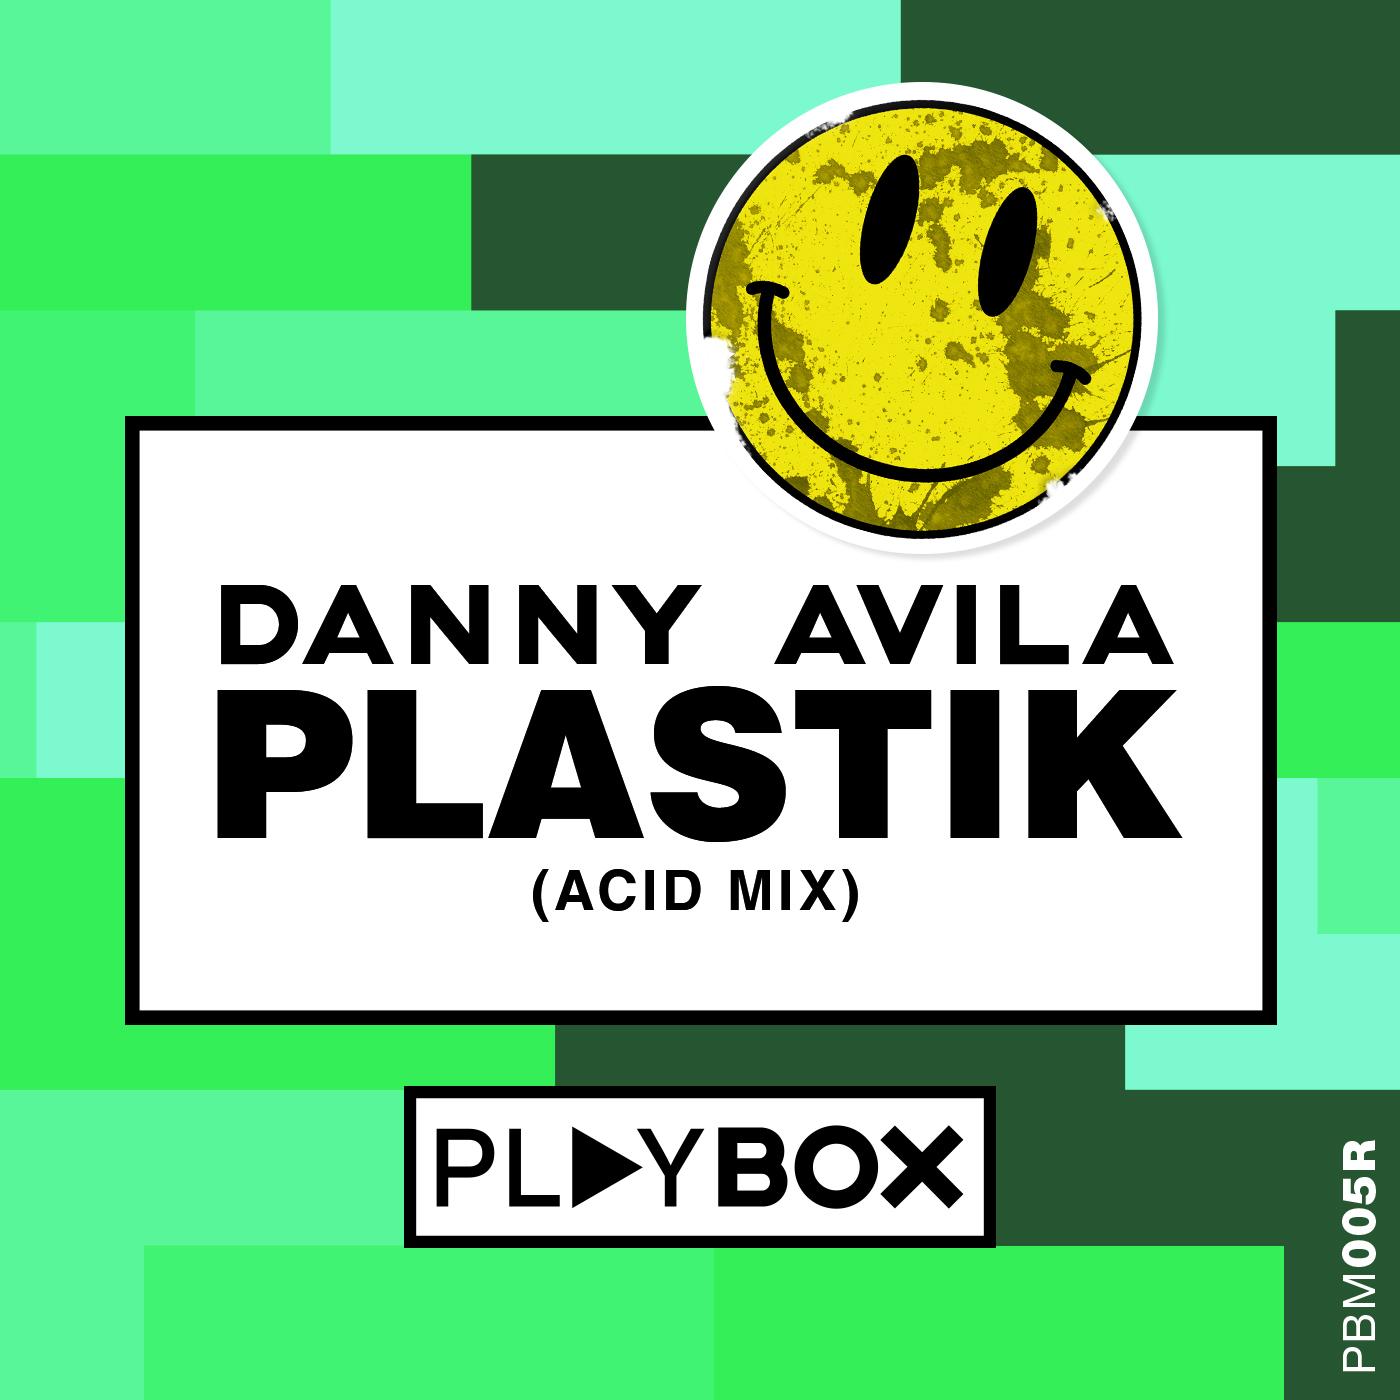 DJ Danny Avila - Plastik (Acid Mix) Full Track